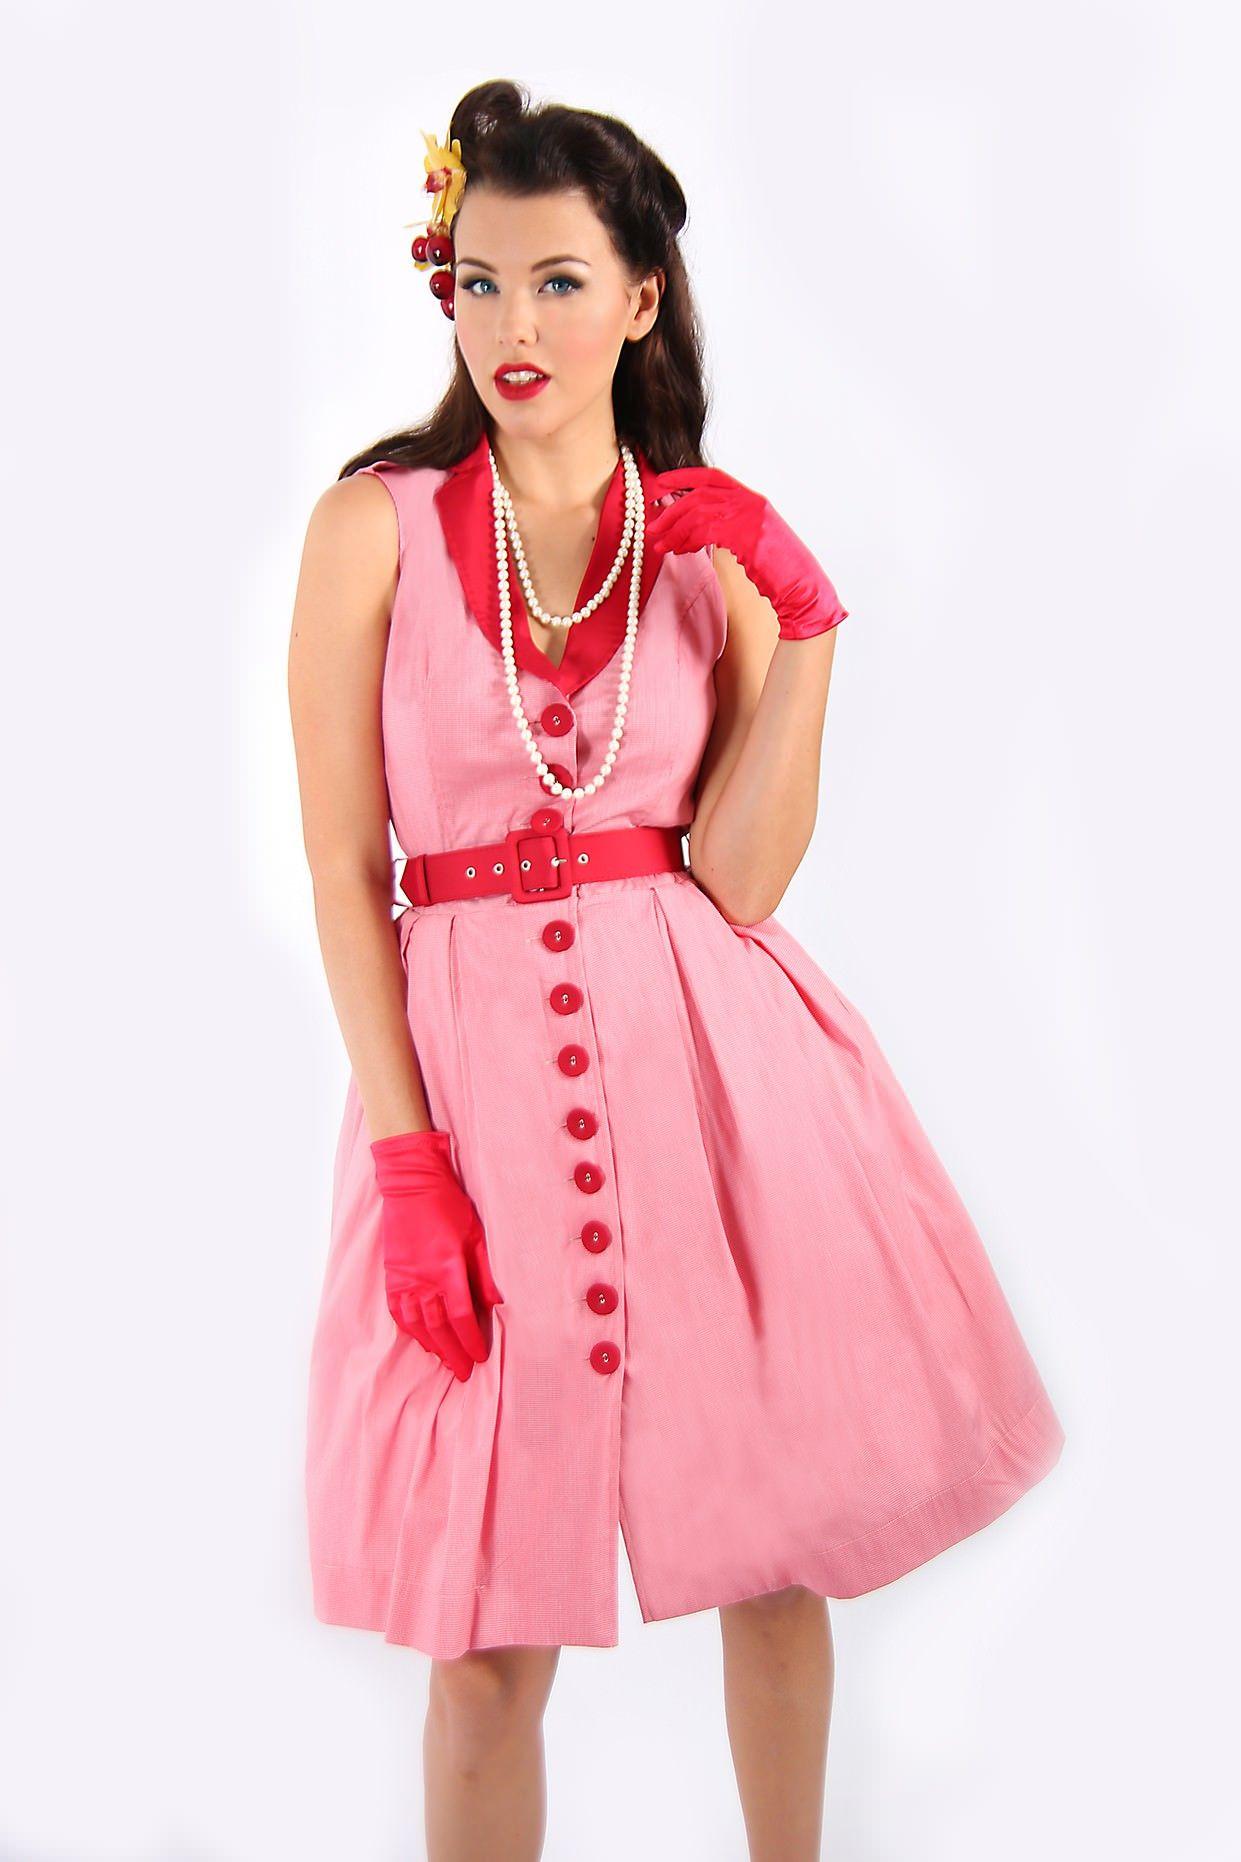 Girl Crazy Red Collar Dress   pin up   Pinterest   Fotografía